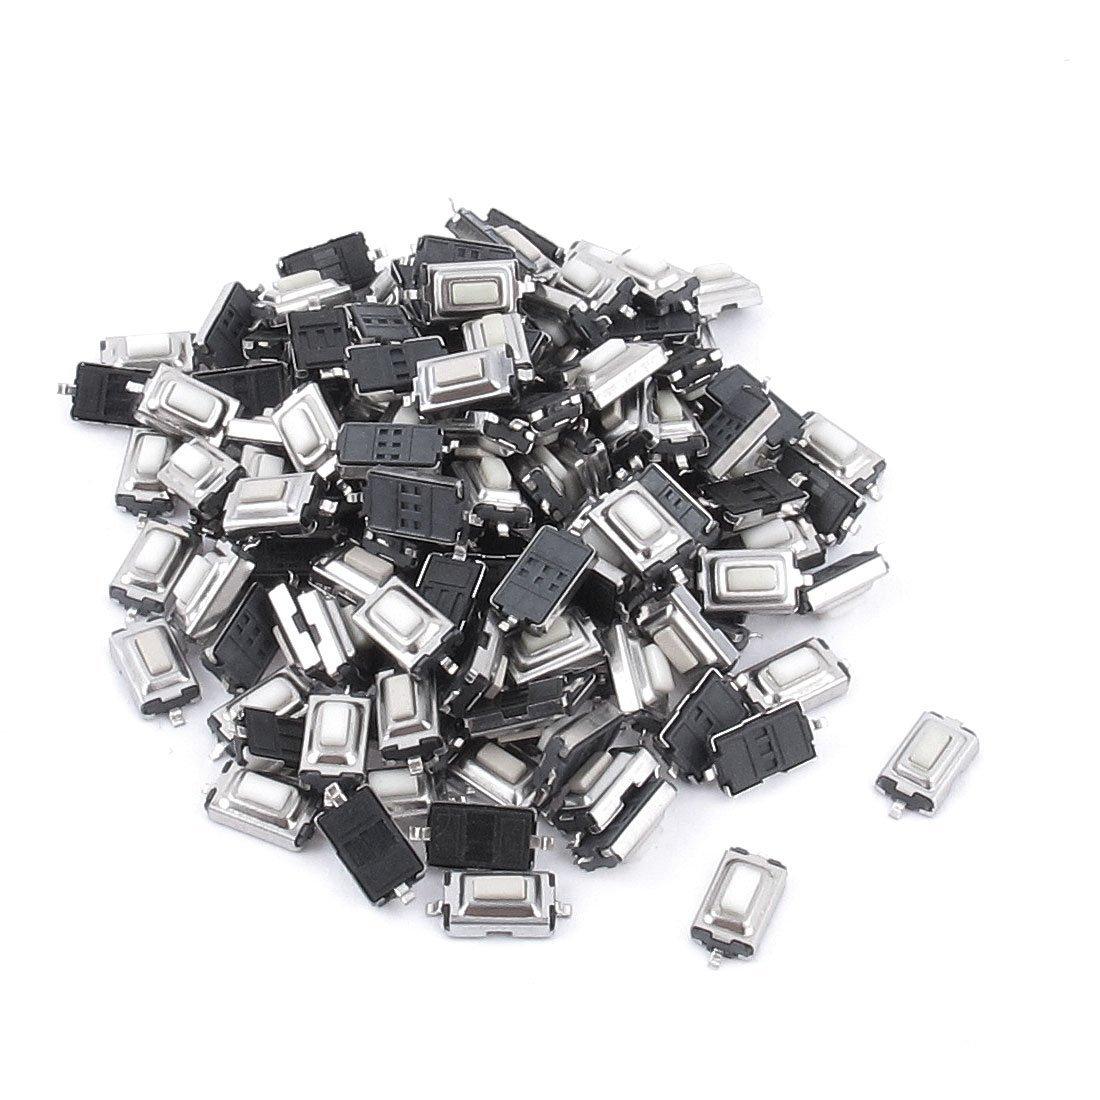 100pcs Touch Micro Switch 3X6X2.5MM 3*6*2.5 SMD White Button Head 6 6 3 1mm smd5 black push button switch 6x6x3 1 touch micro switch 100pcs